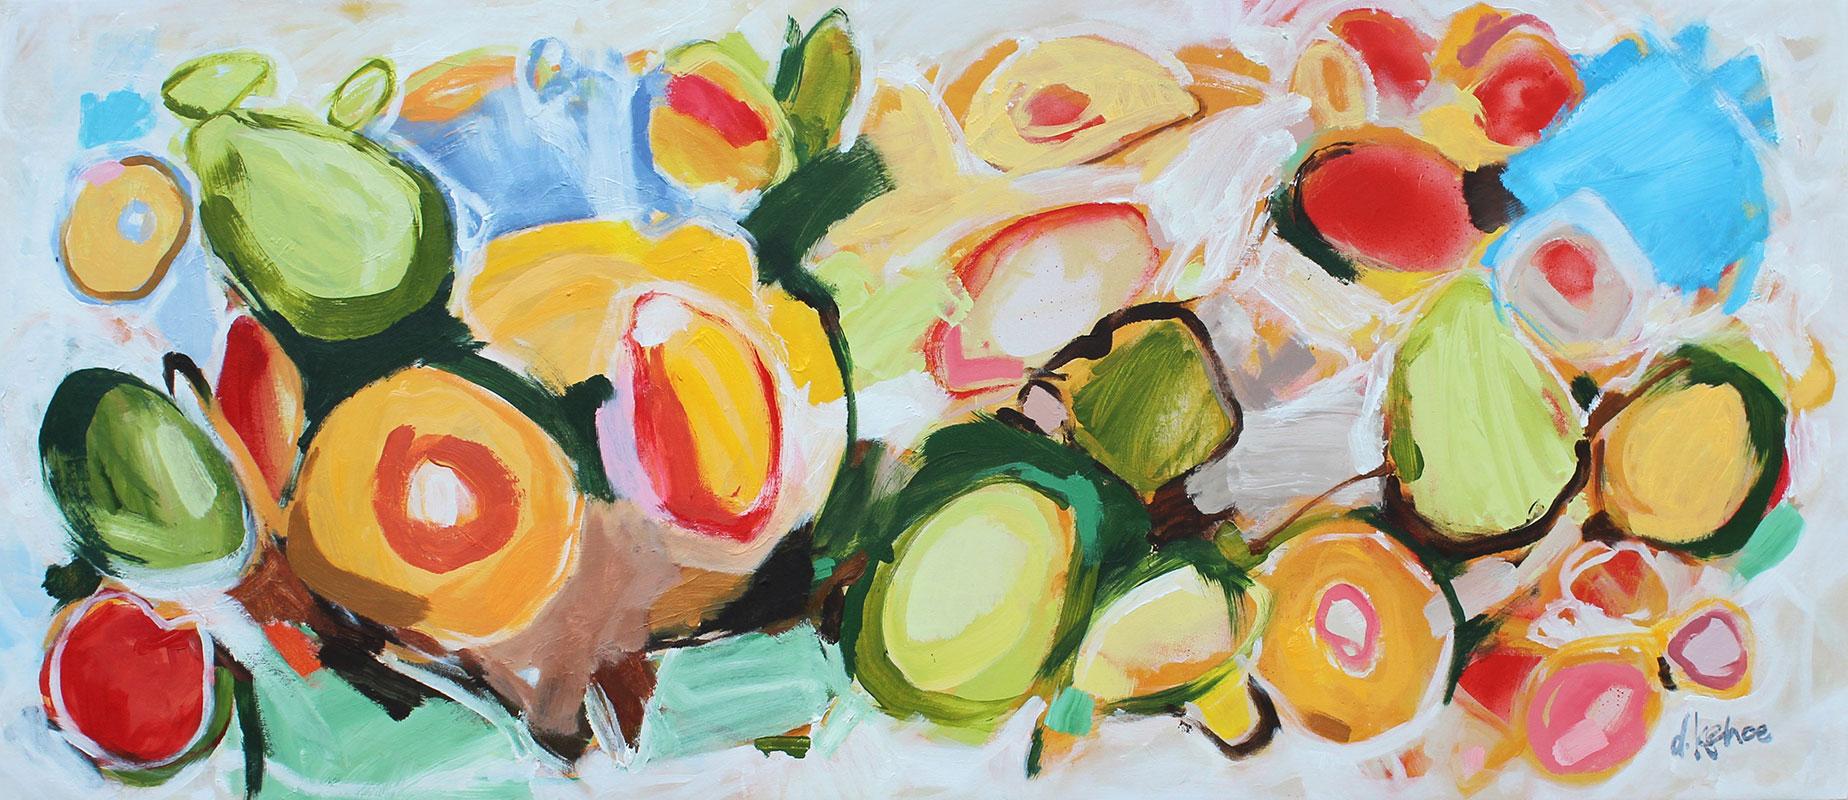 Dianne Kehoe - Chardonnay! - Acrylic on canvas